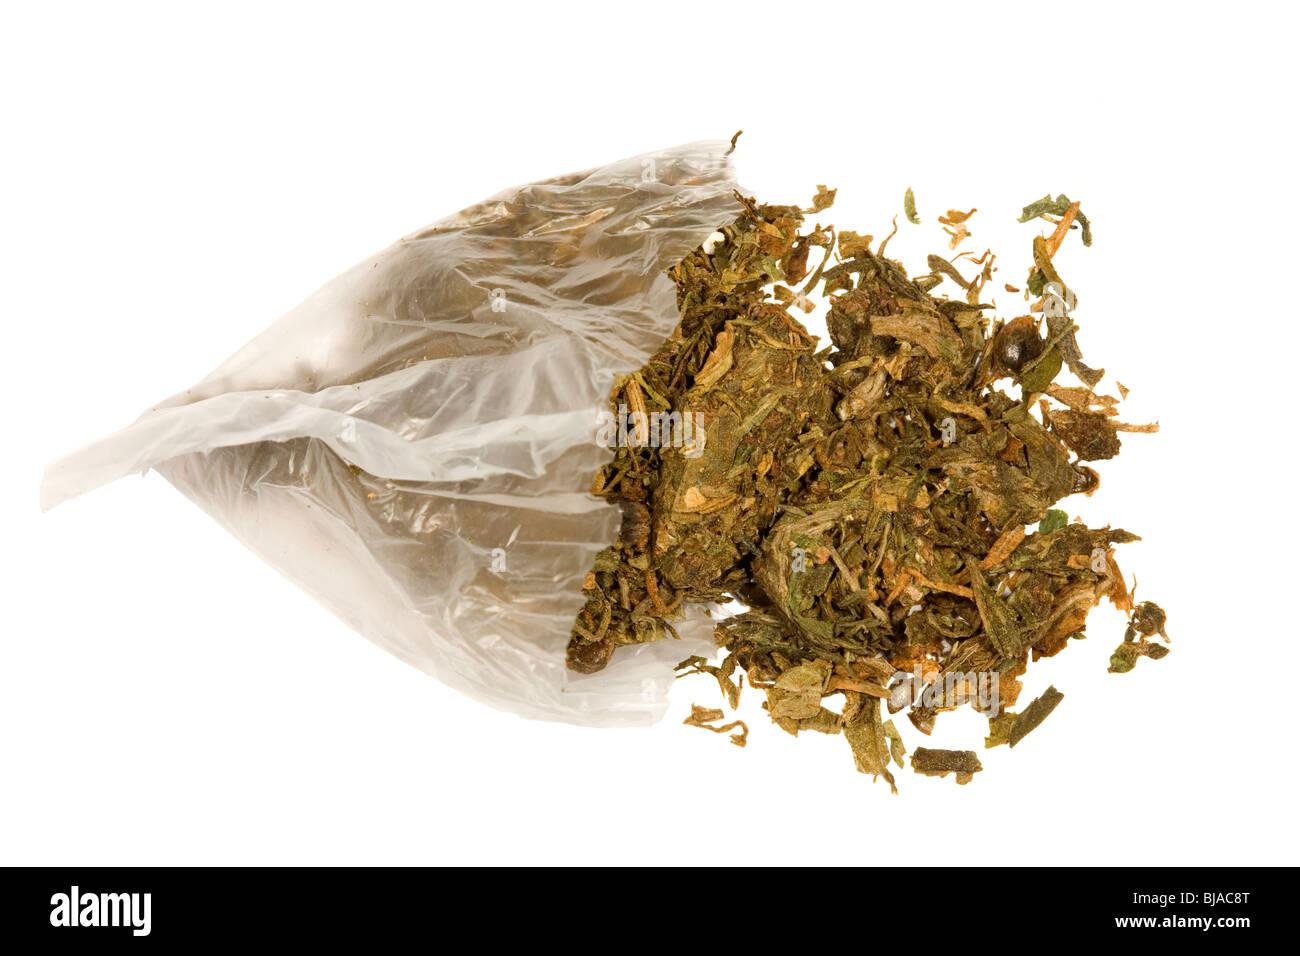 Weed Bag Stock Photos & Weed Bag Stock Images - Alamy